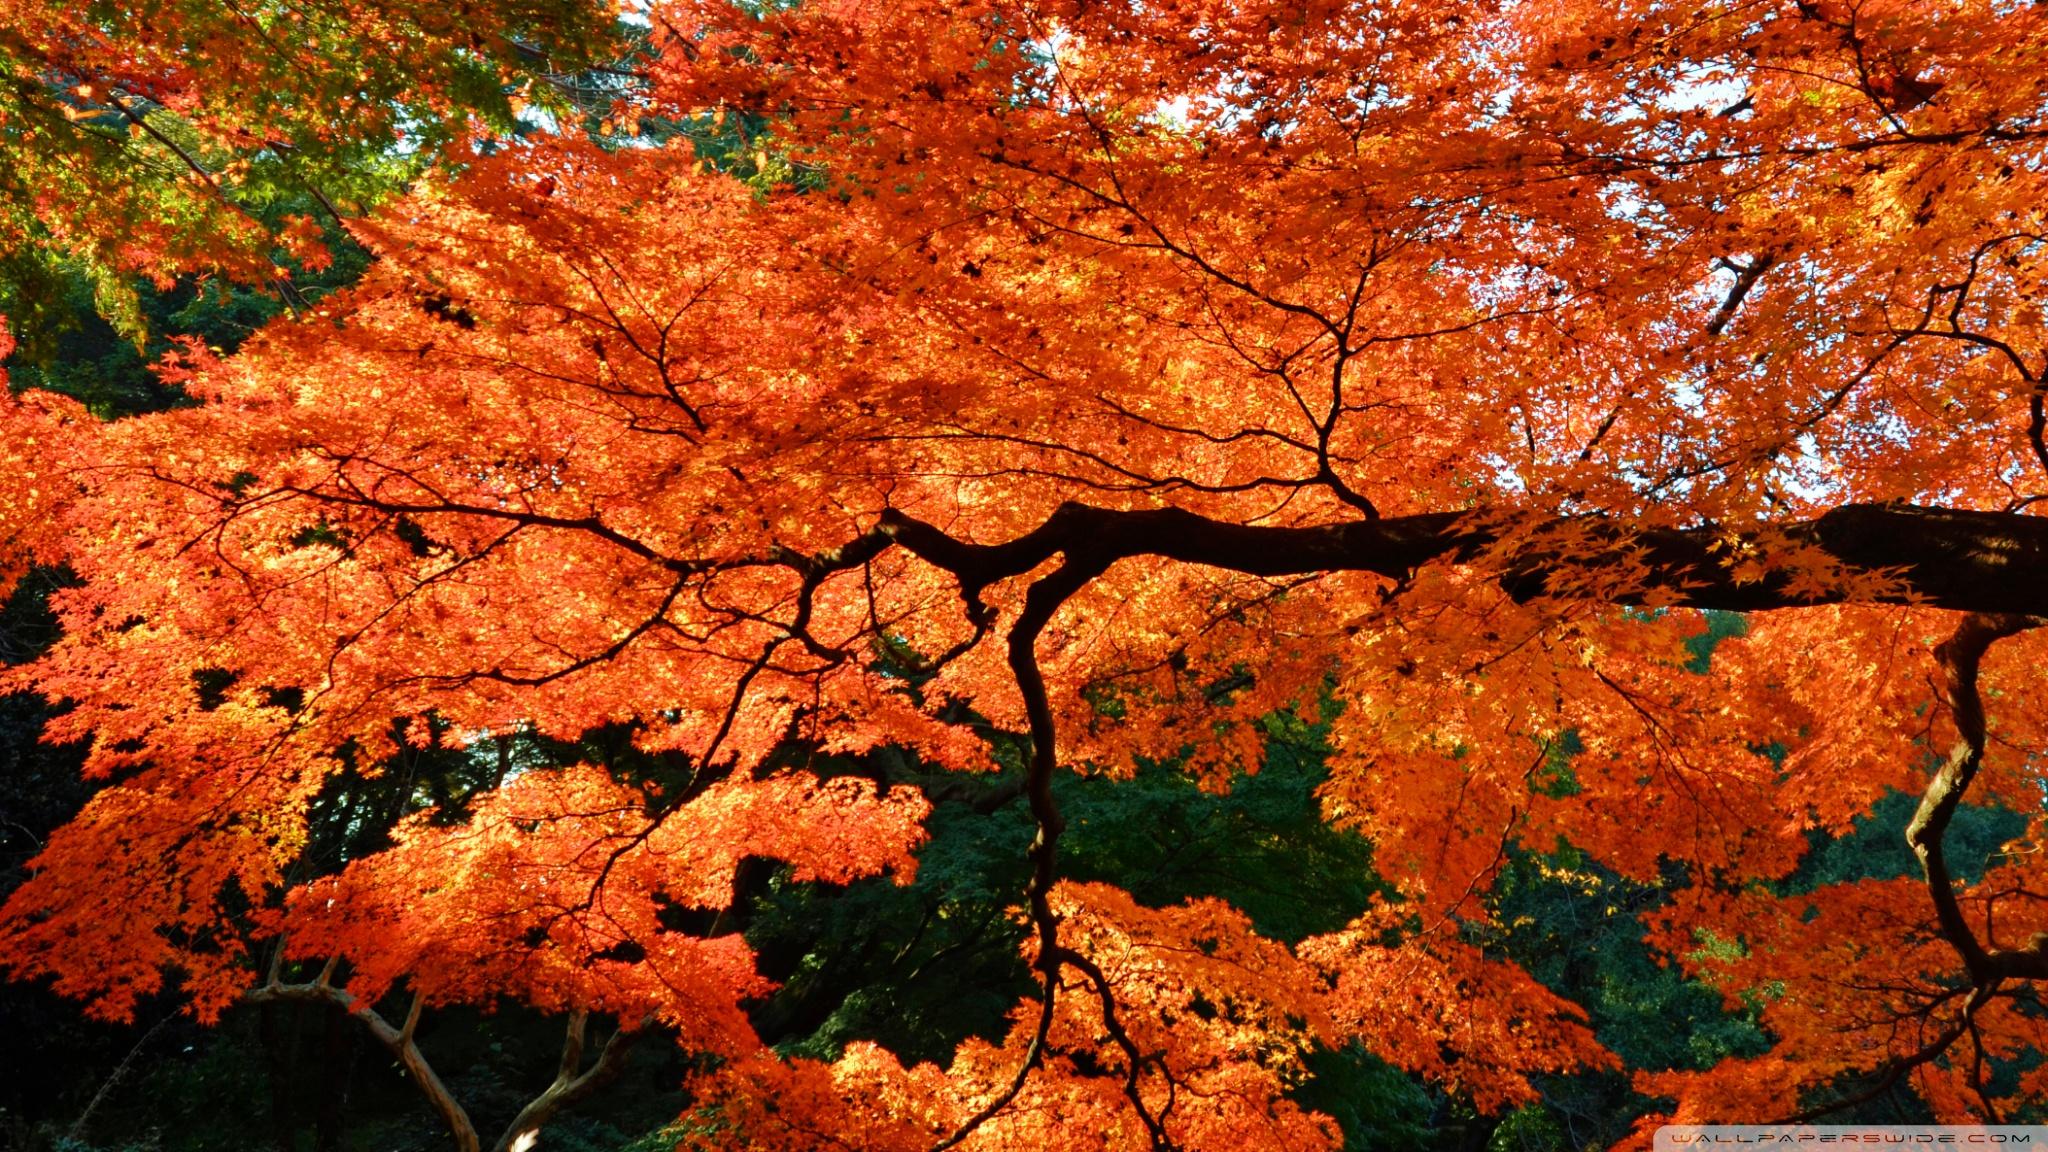 Fall Computer Wallpaper Backgrounds Beautiful Japanese Maple Tree 4k Hd Desktop Wallpaper For